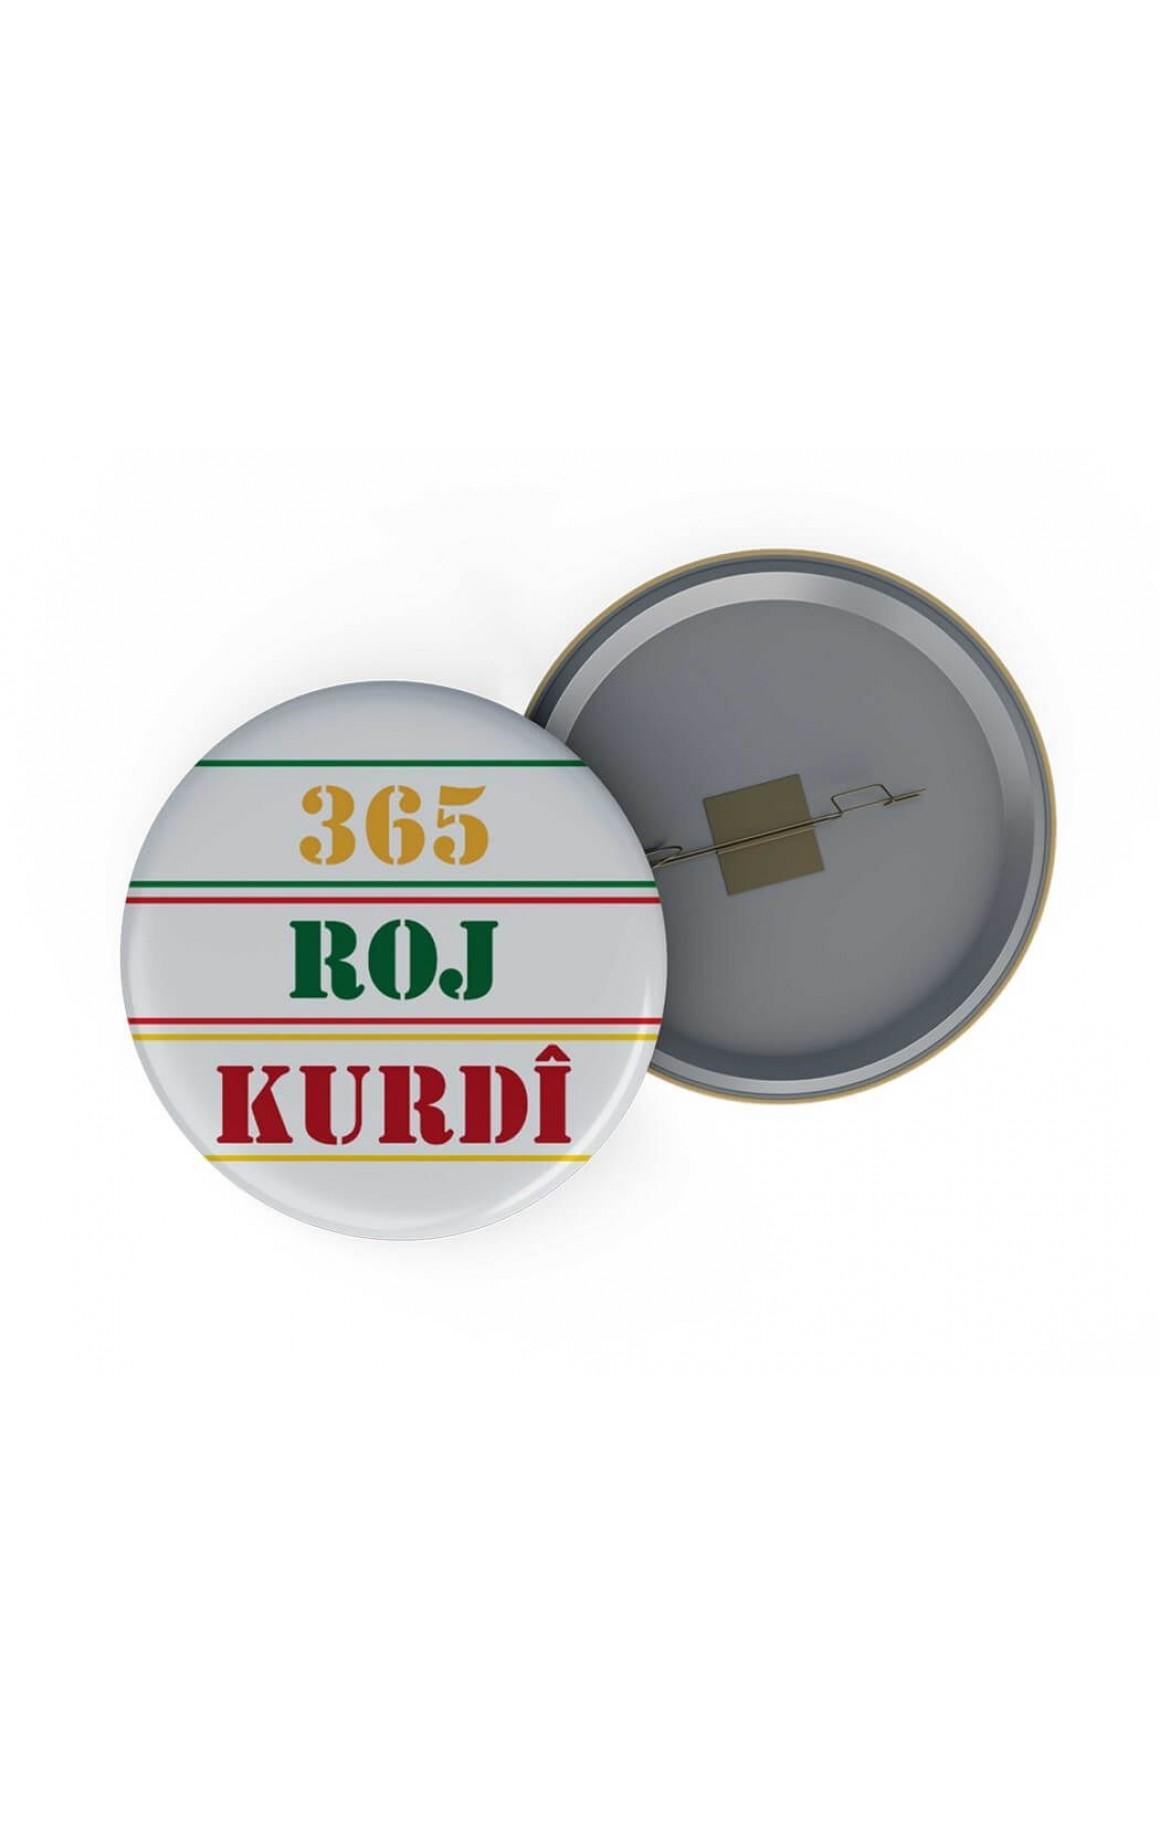 Rozet - 365 roj kurdî